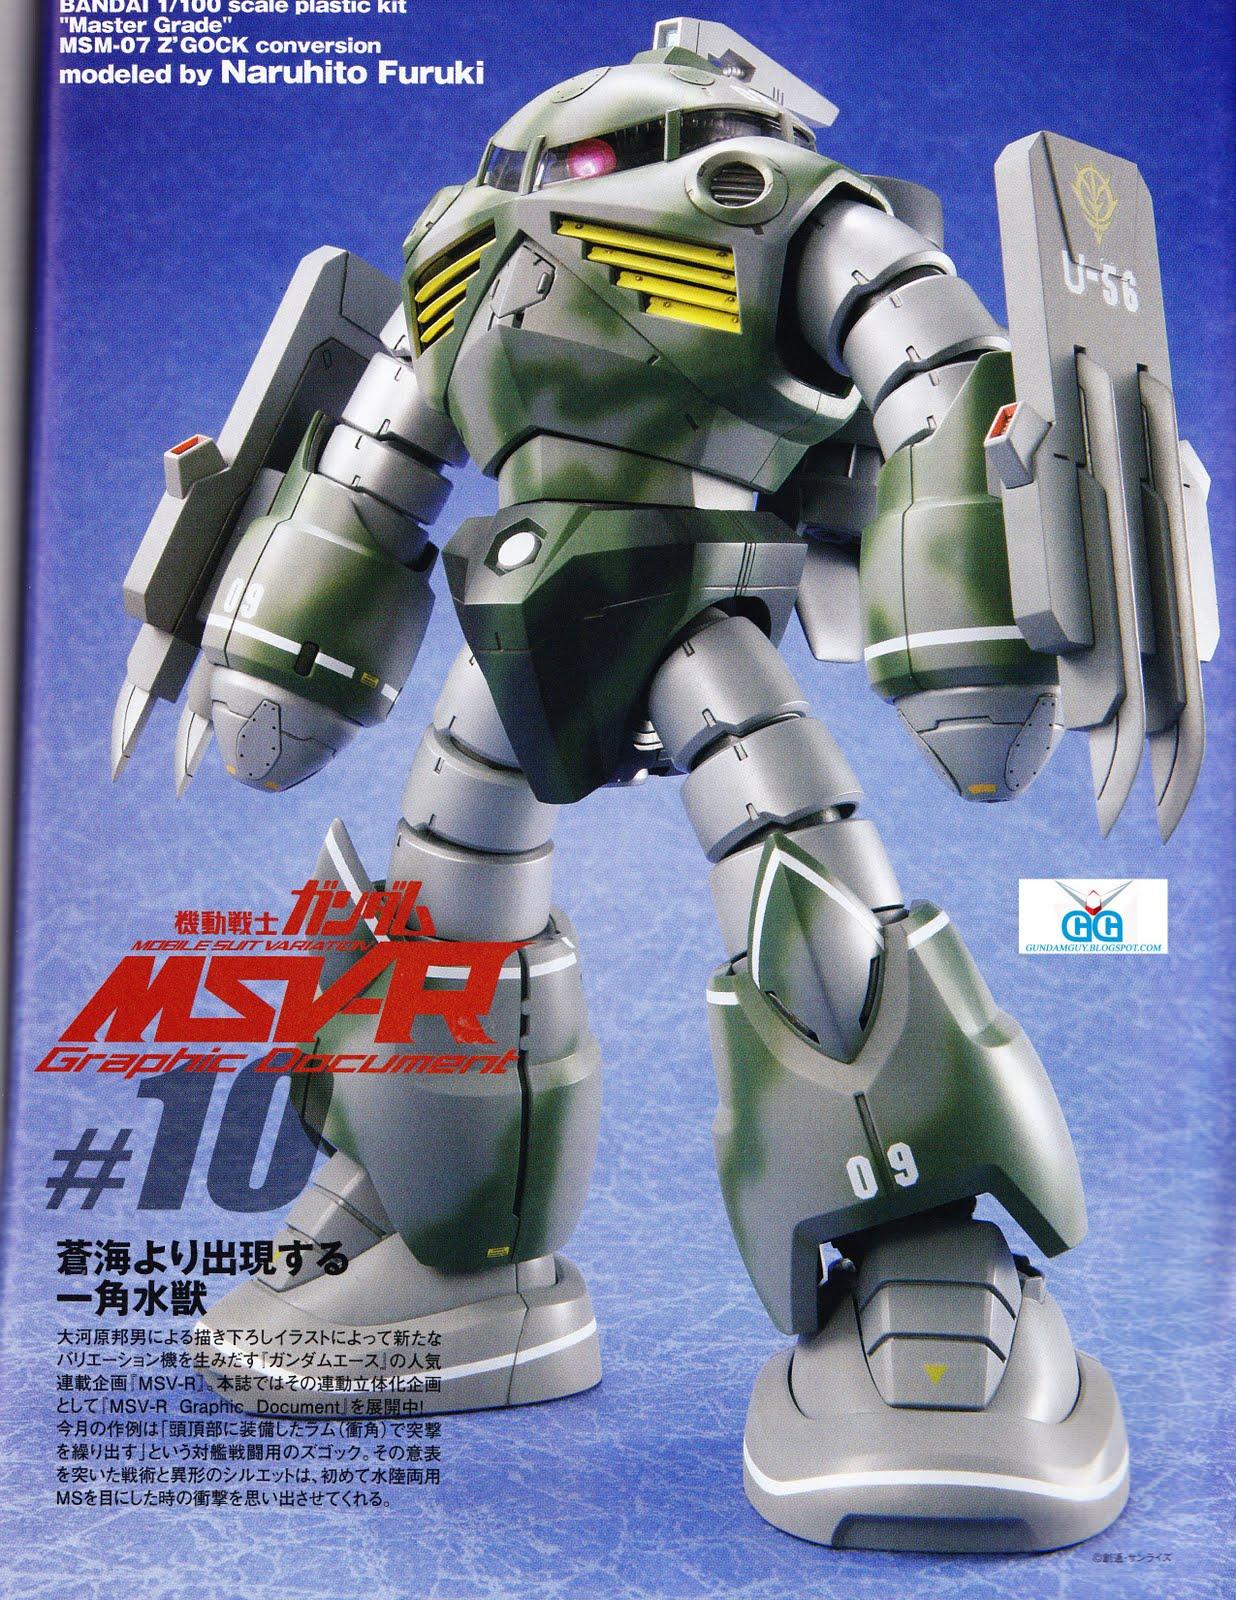 MSM-07N RAM Z'Gock (MG MSM-07 Z'Gock Conversion)